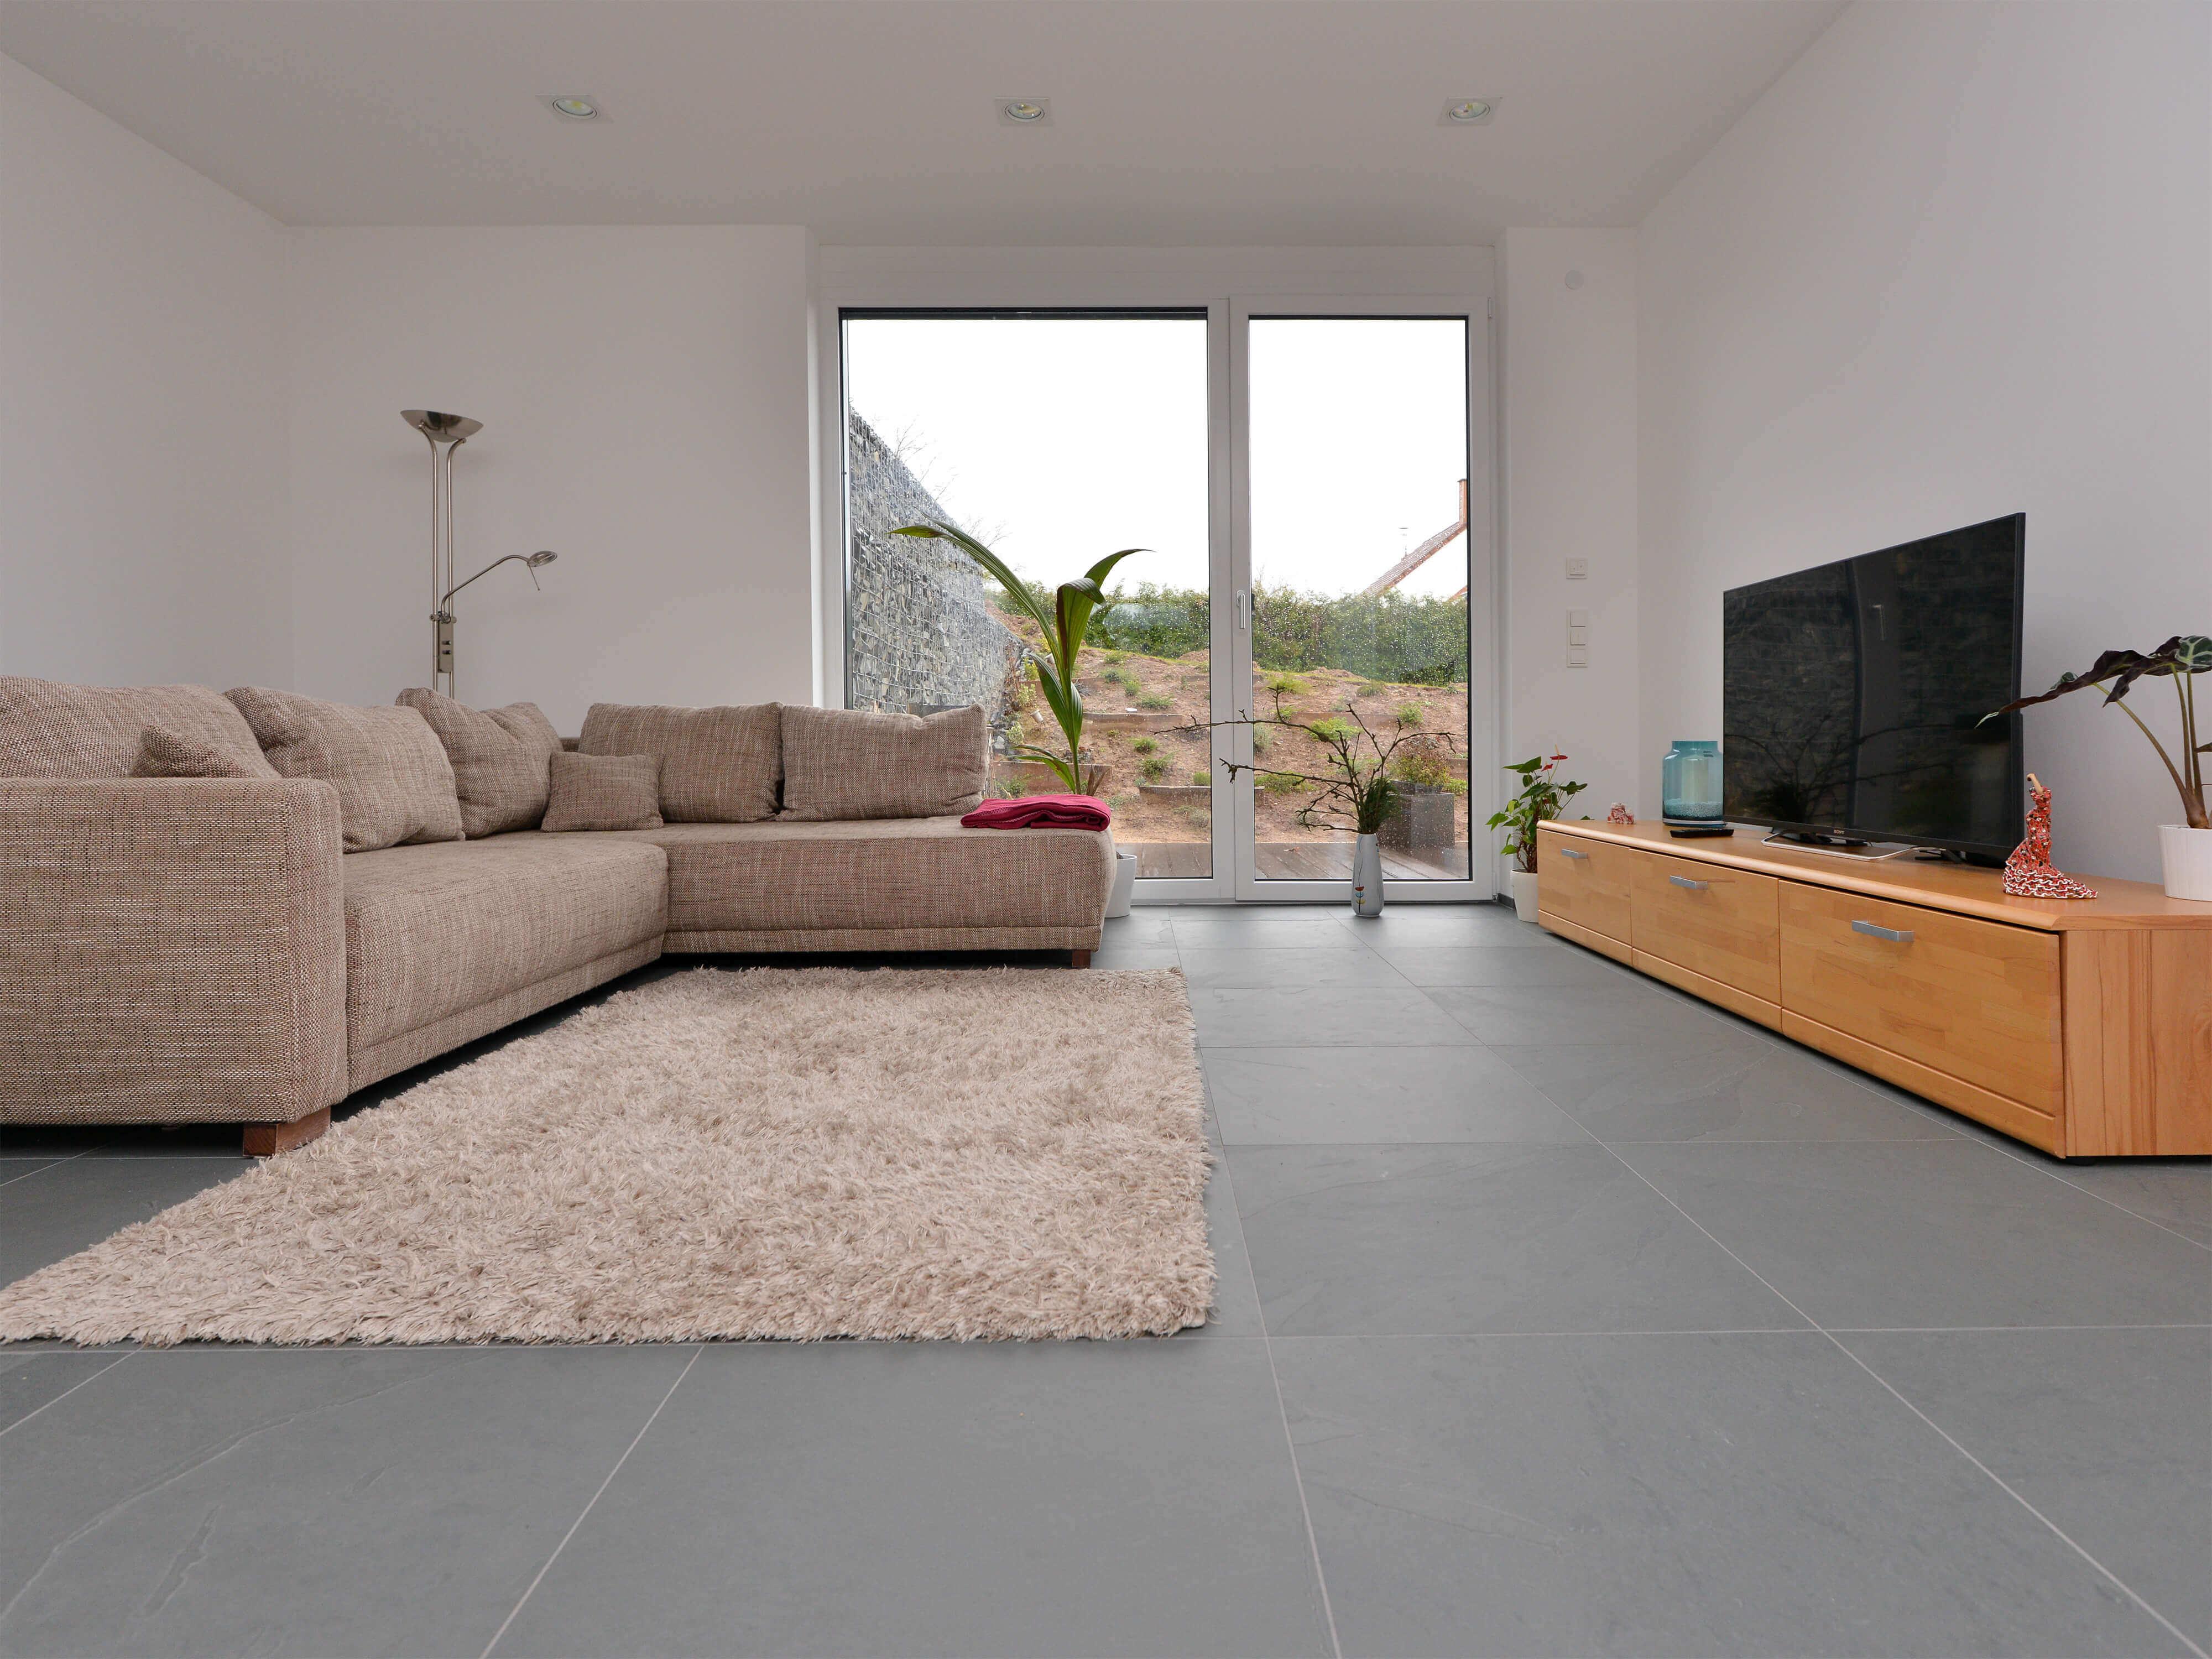 Schieferfliese Grey Slate Stonenaturelle Natursteinböden